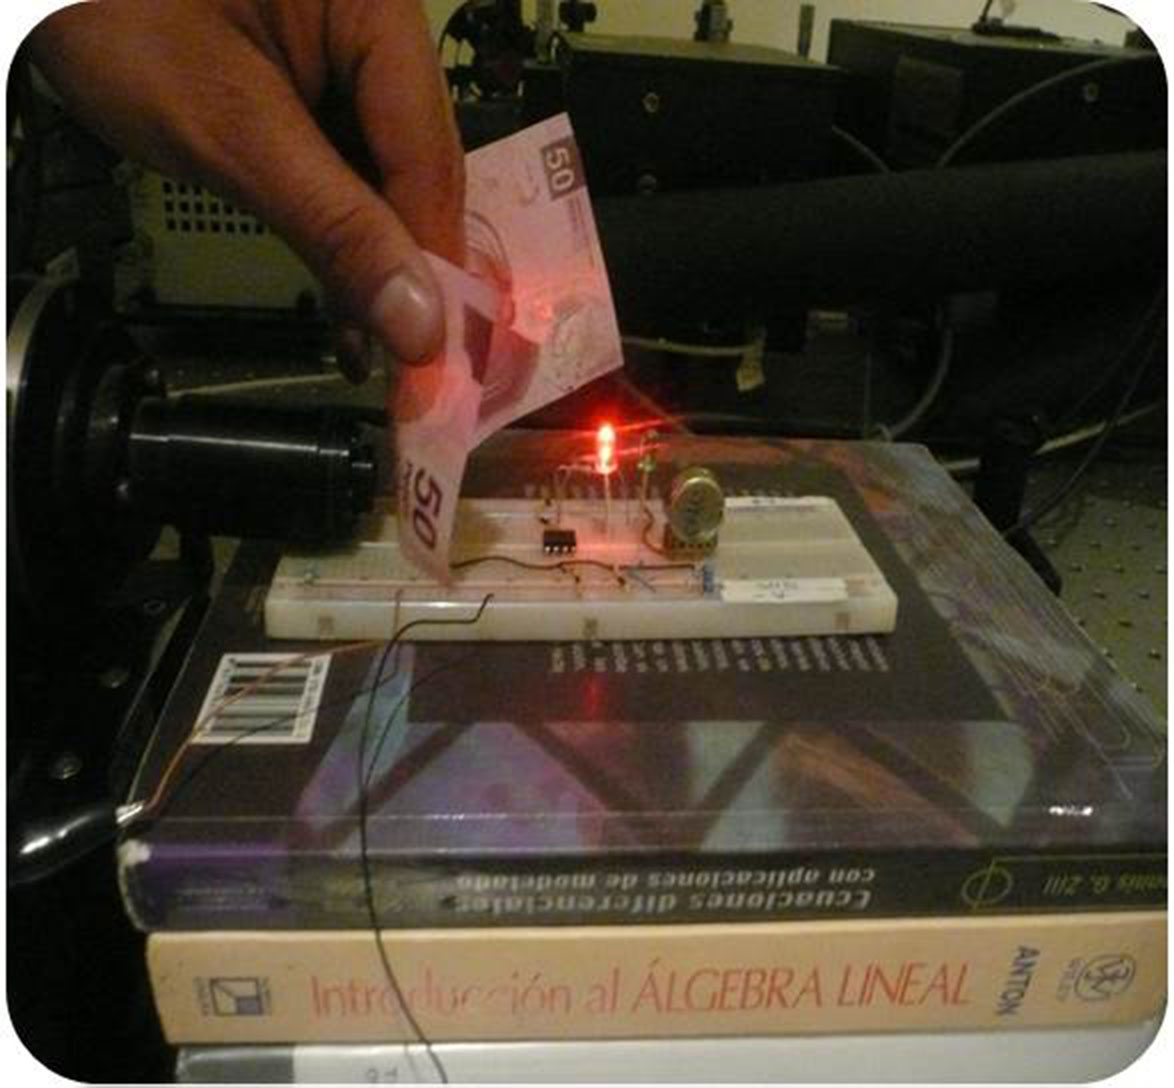 Luz infrarroja para evitar falsificación de billetes